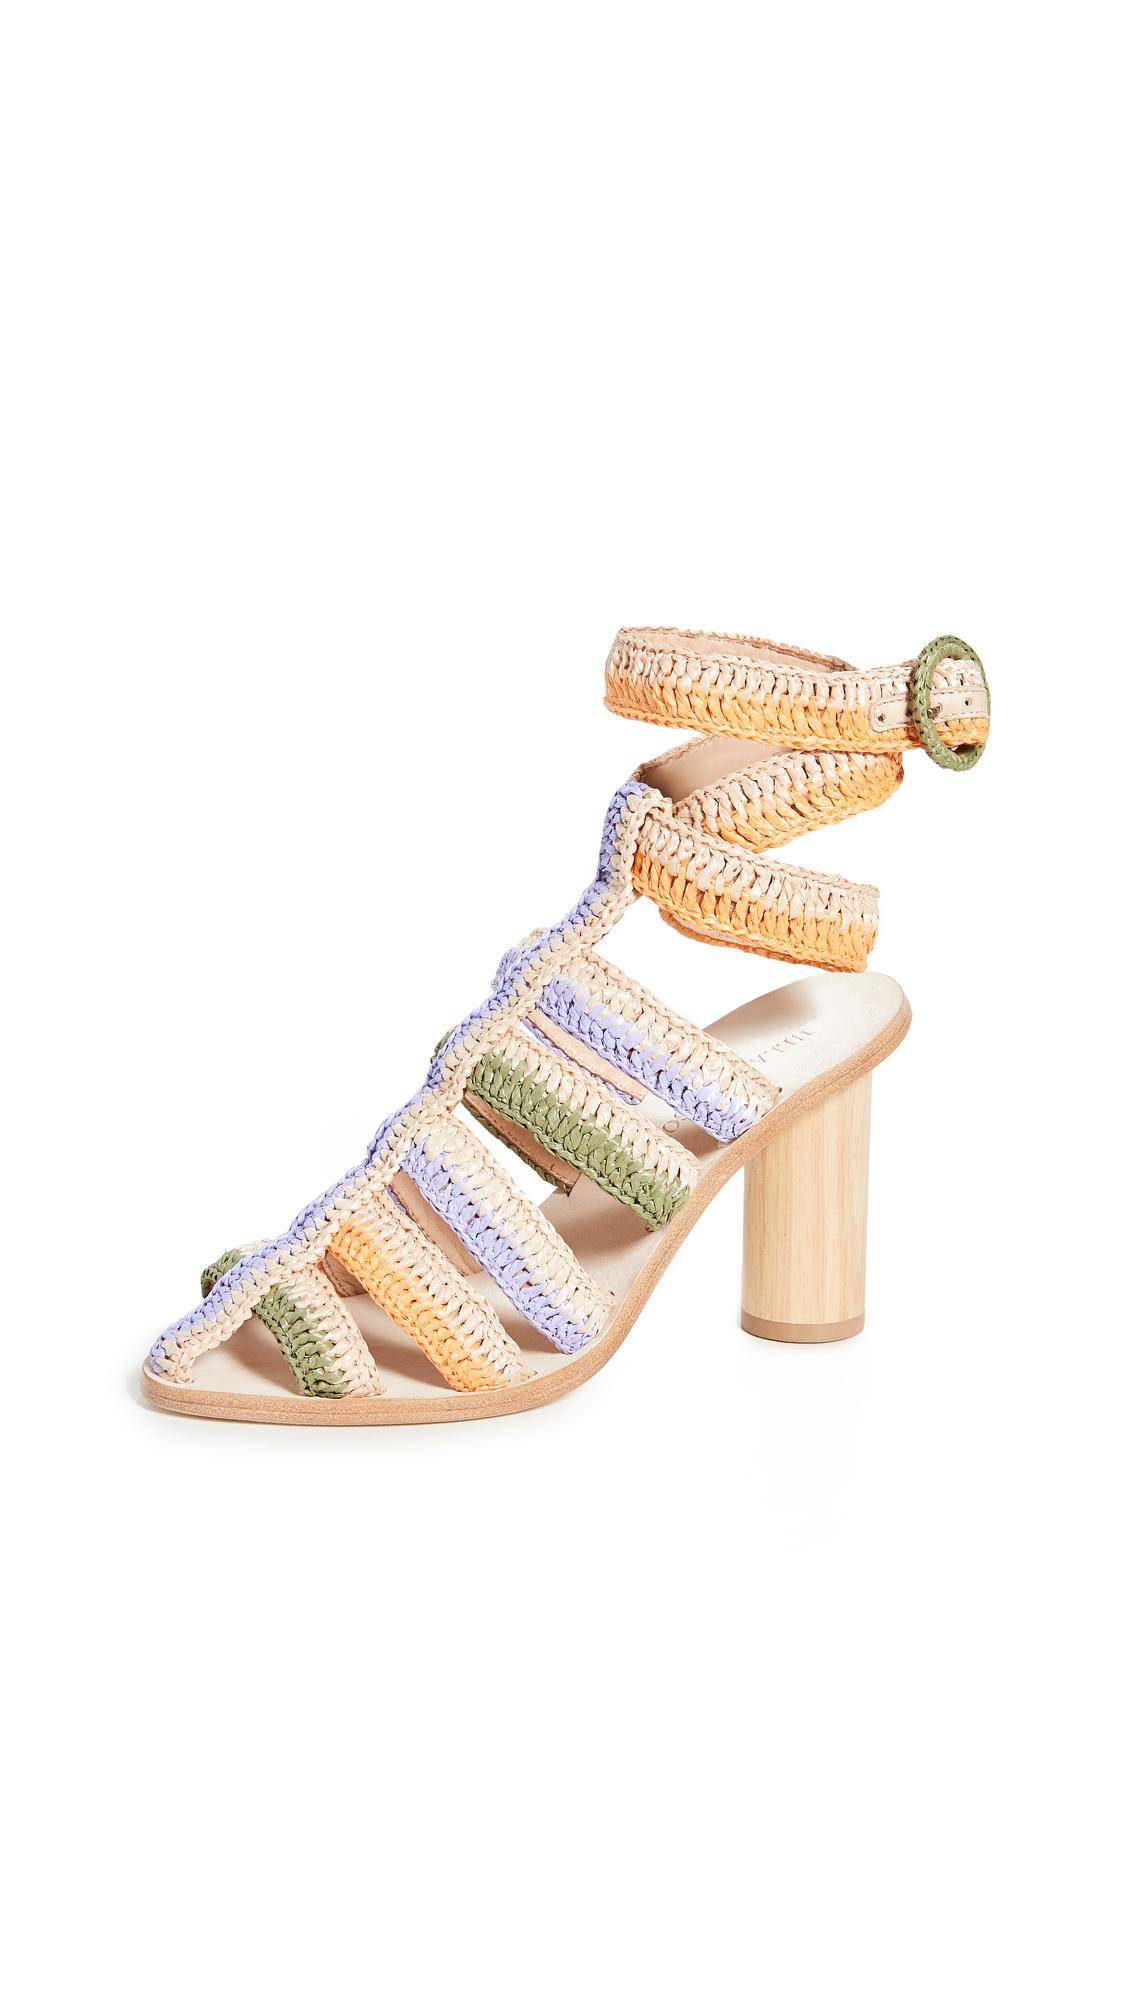 Buy Ulla Johnson Katya Heel Sandals online, shop Ulla Johnson